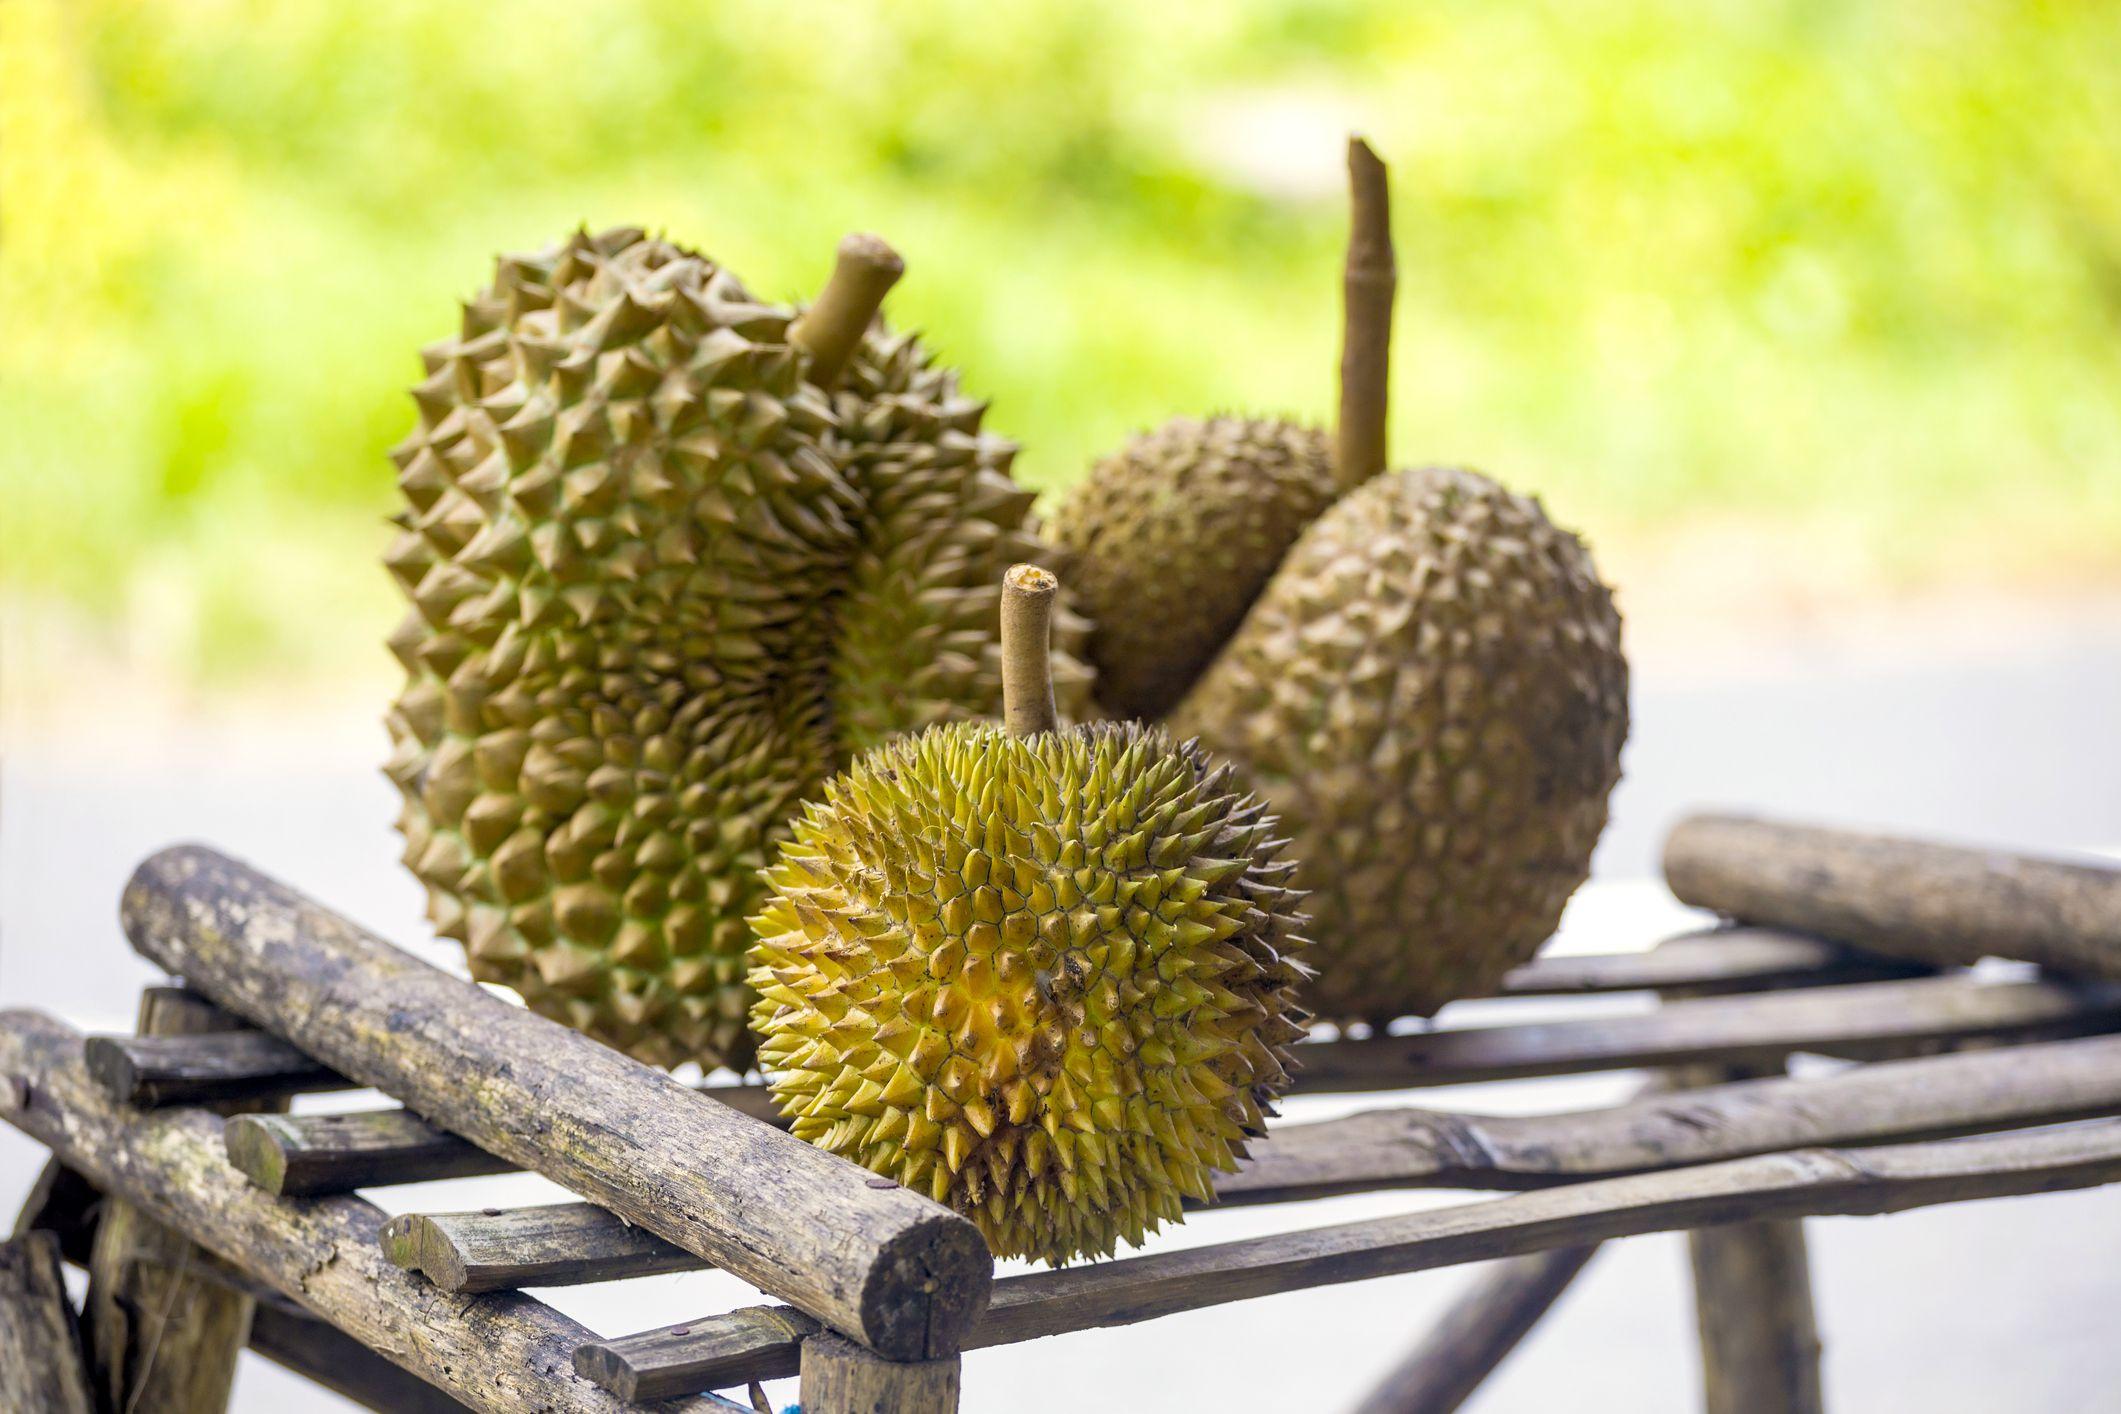 Durian Getty 5a1b0d1a89eacc ef6b